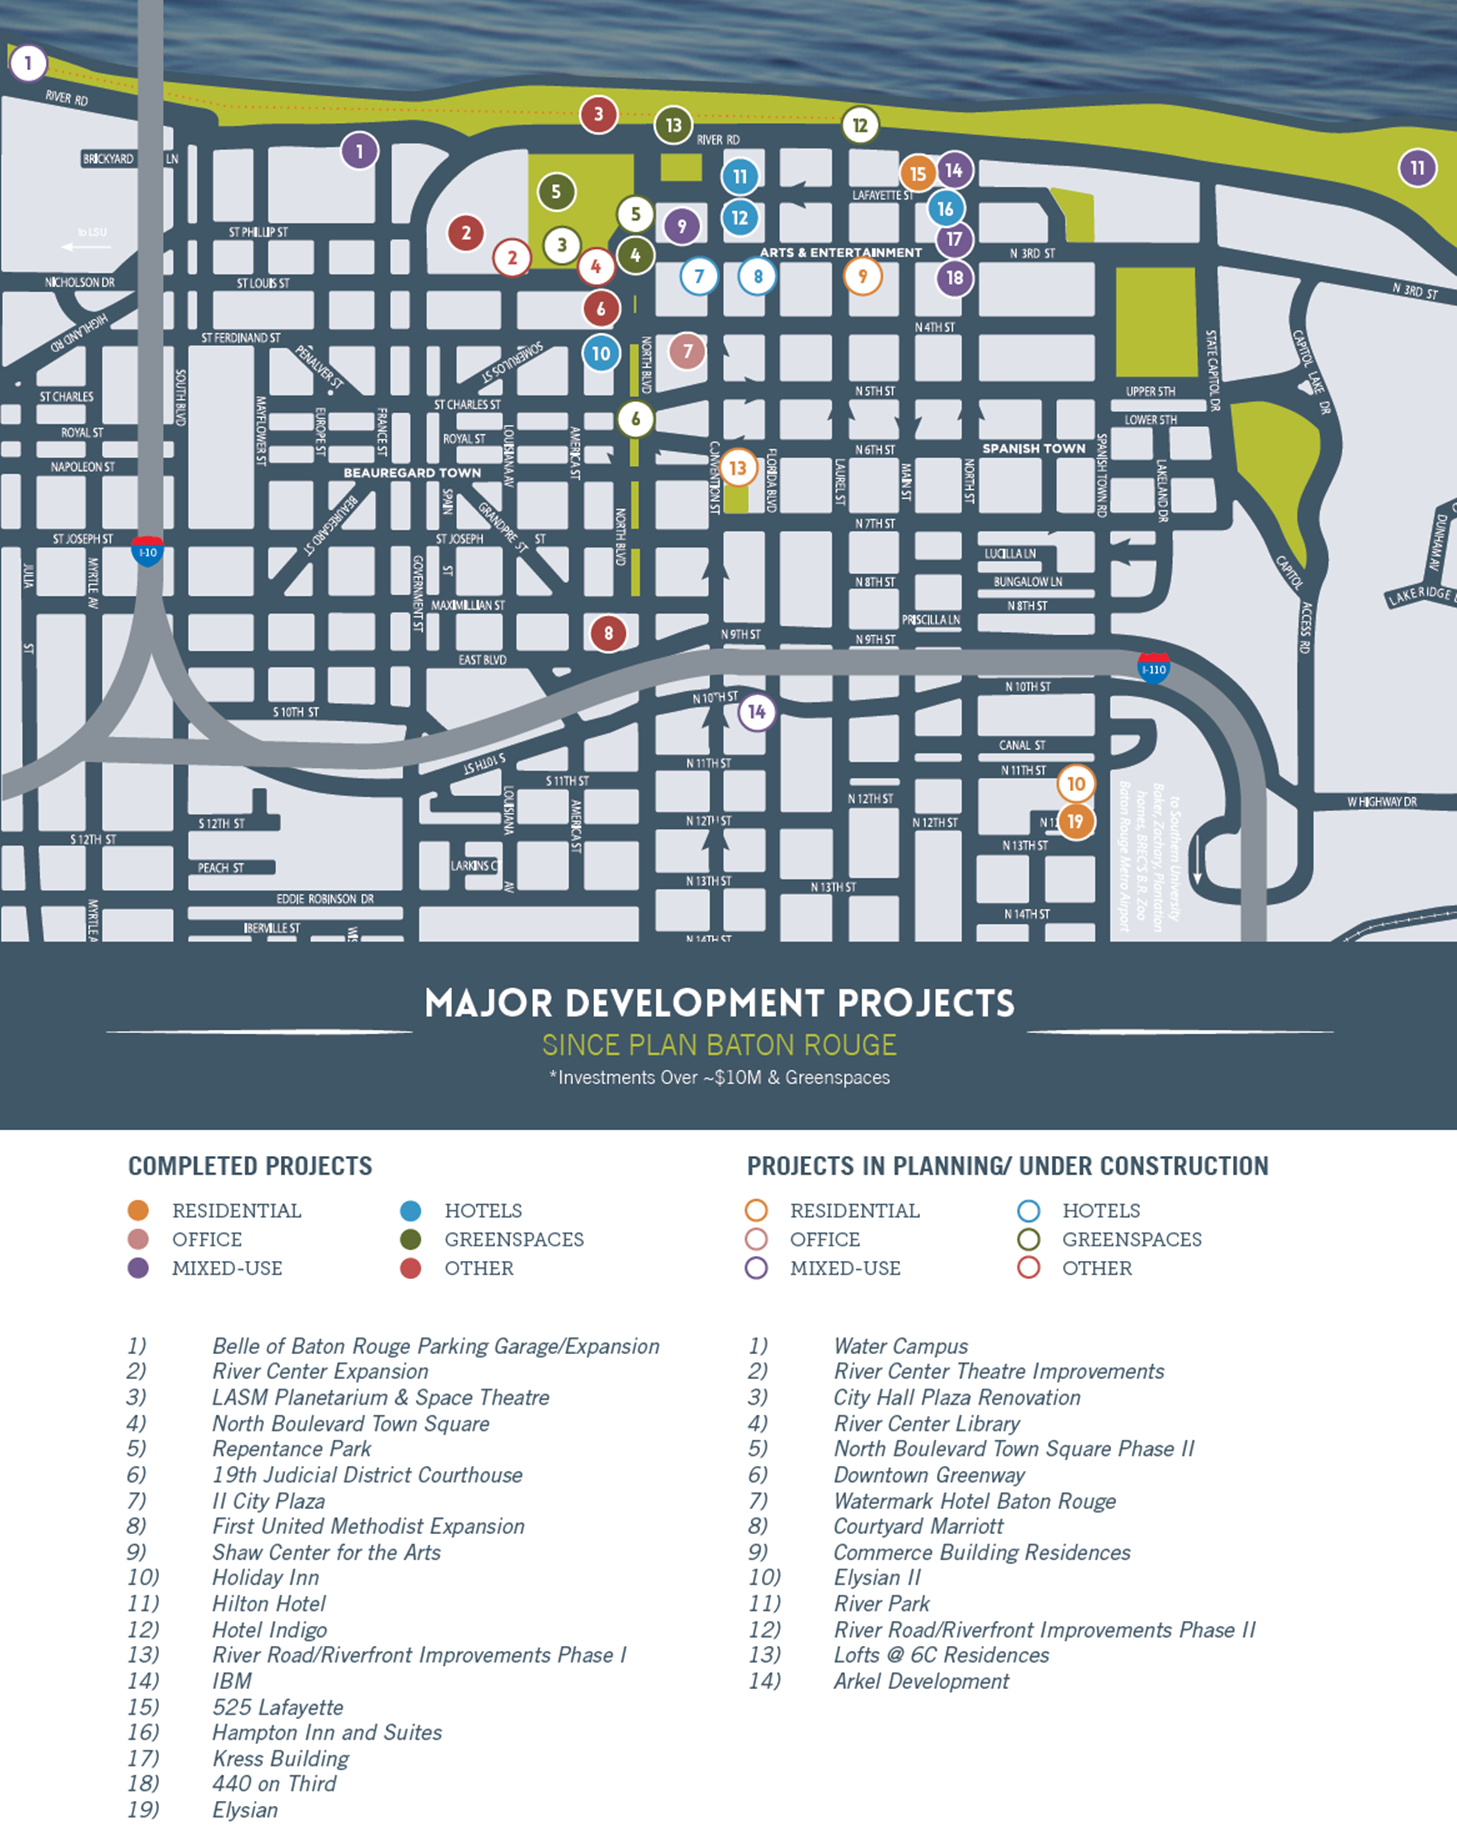 HVS Market Report Baton Rouge LA By Bunmi Adeboye